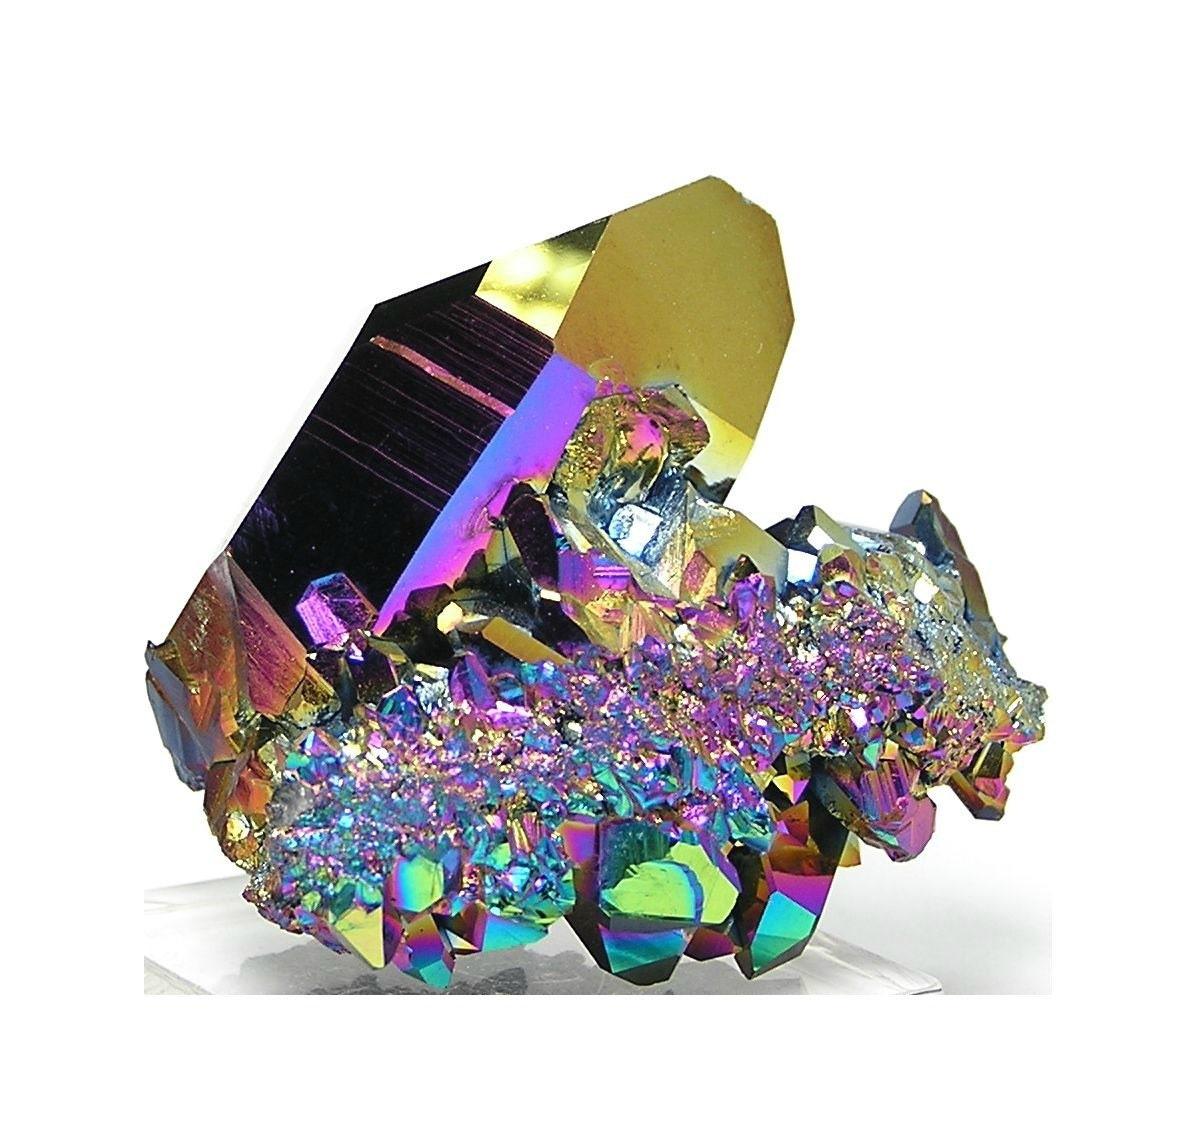 Rainbow Quartz Stone : Rainbow aura peacock quartz crystal cluster from arkansas